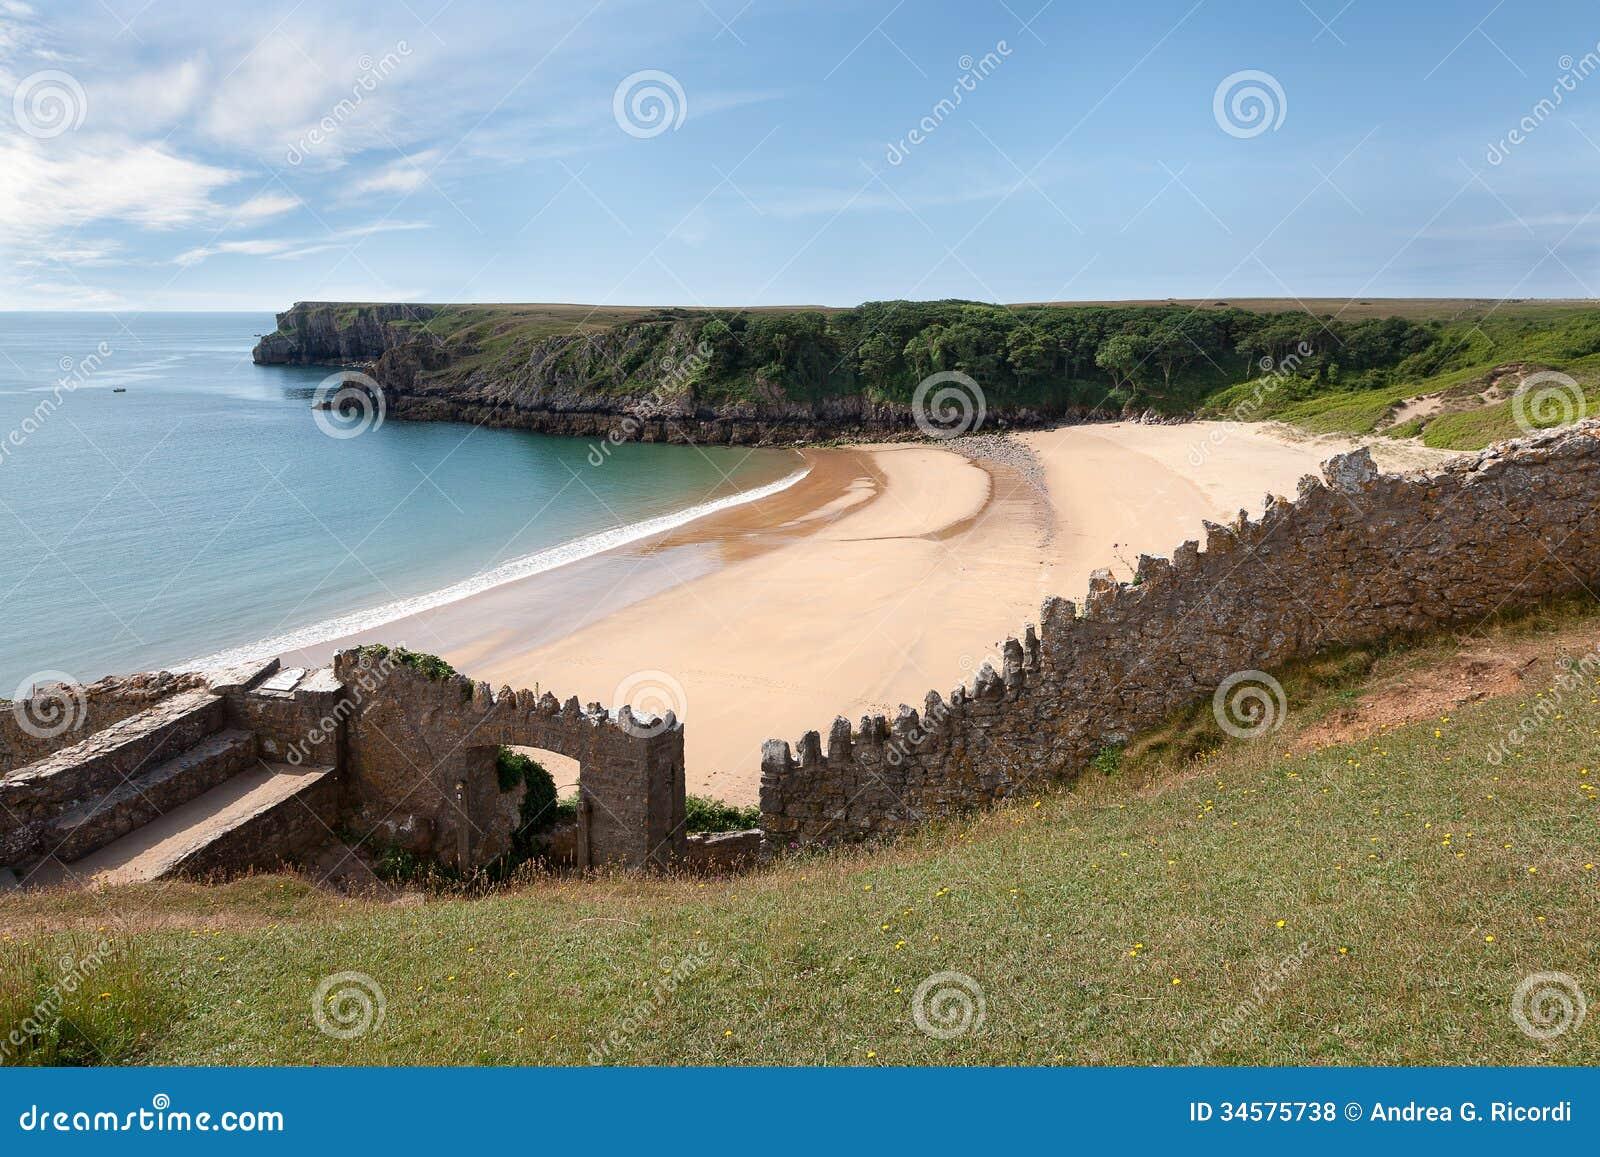 Sandy Coast - Stone Wall